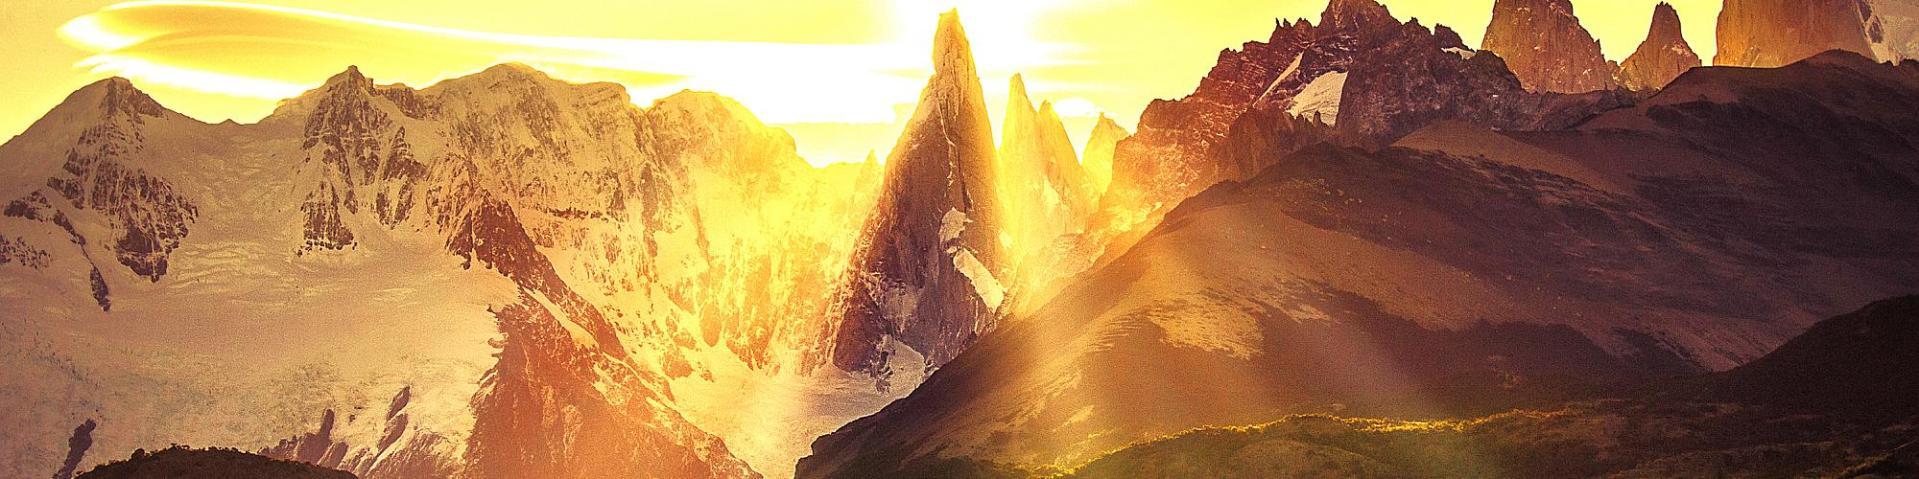 Affordable wellness retreats WordPress websites - Mountain Sunrise Light 3 - Optimized Featured Image